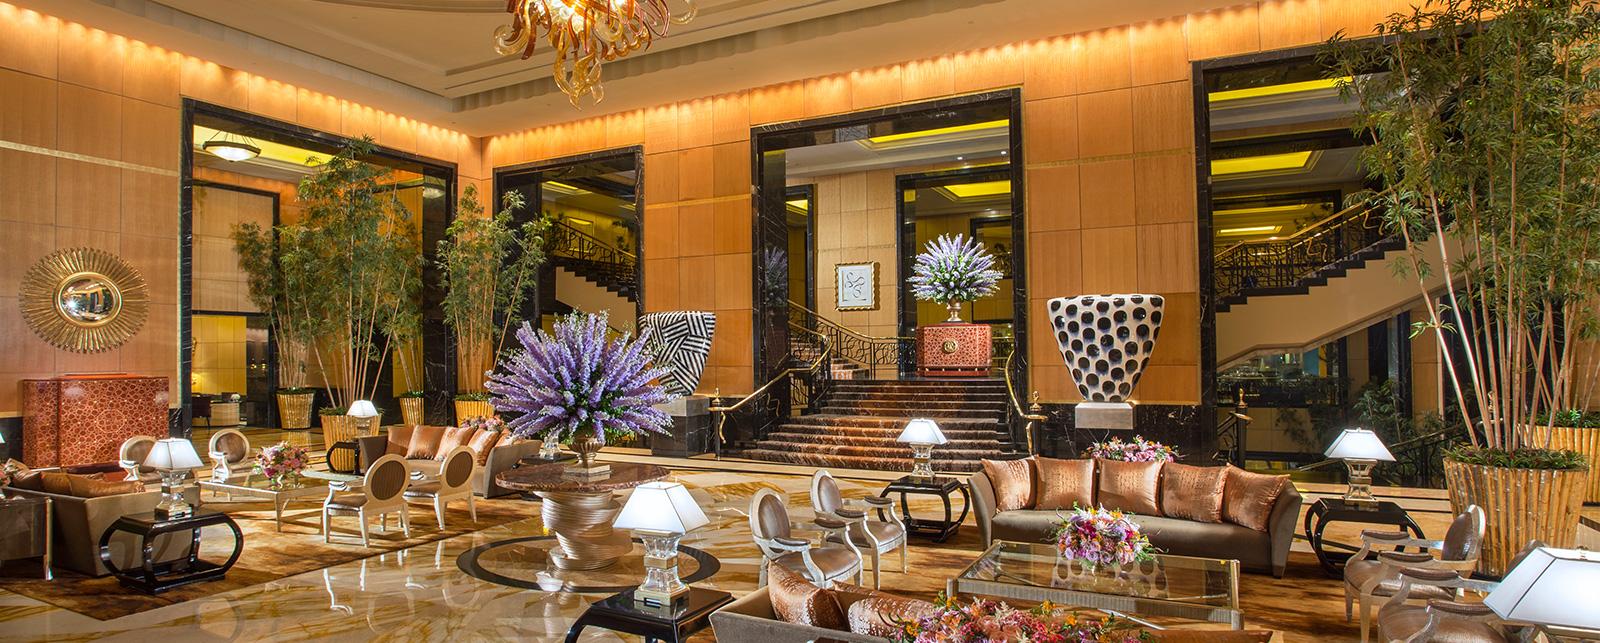 Mulia jakarta hotels bali resorts official site for Design hotel jakarta